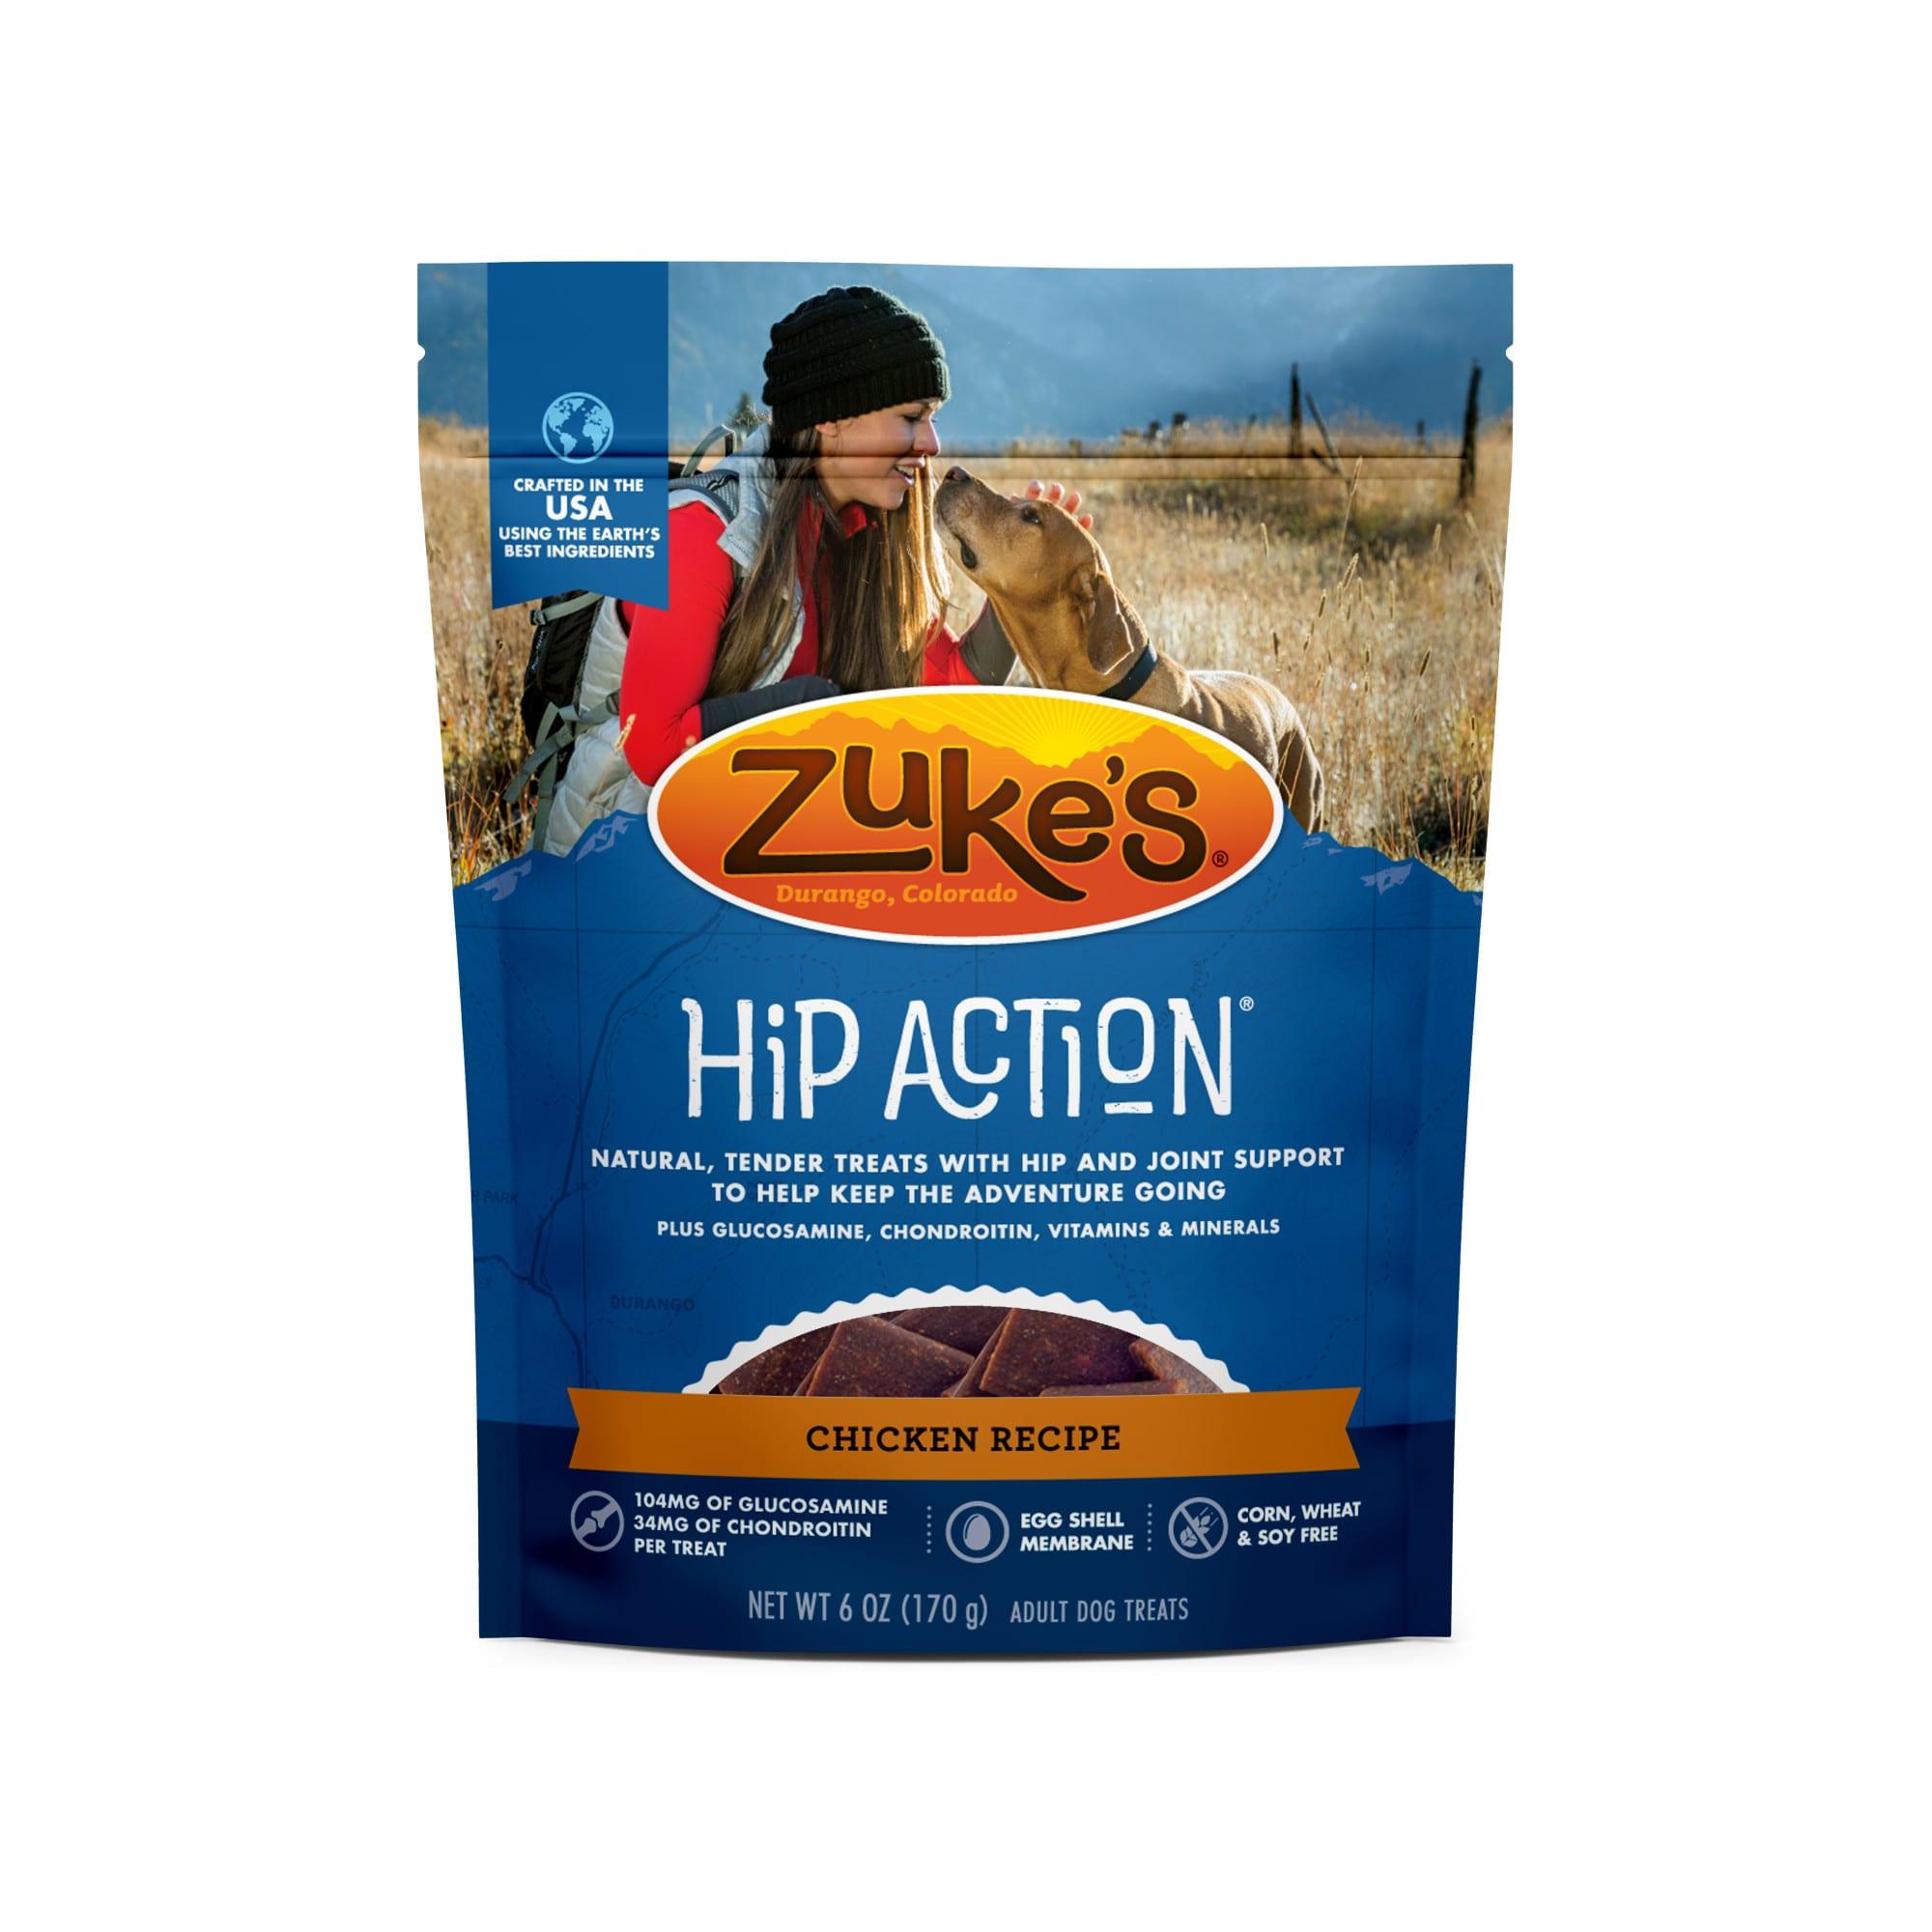 Image of Zuke's Hip Action Roasted Chicken Recipe Dog Treats, 6 oz.